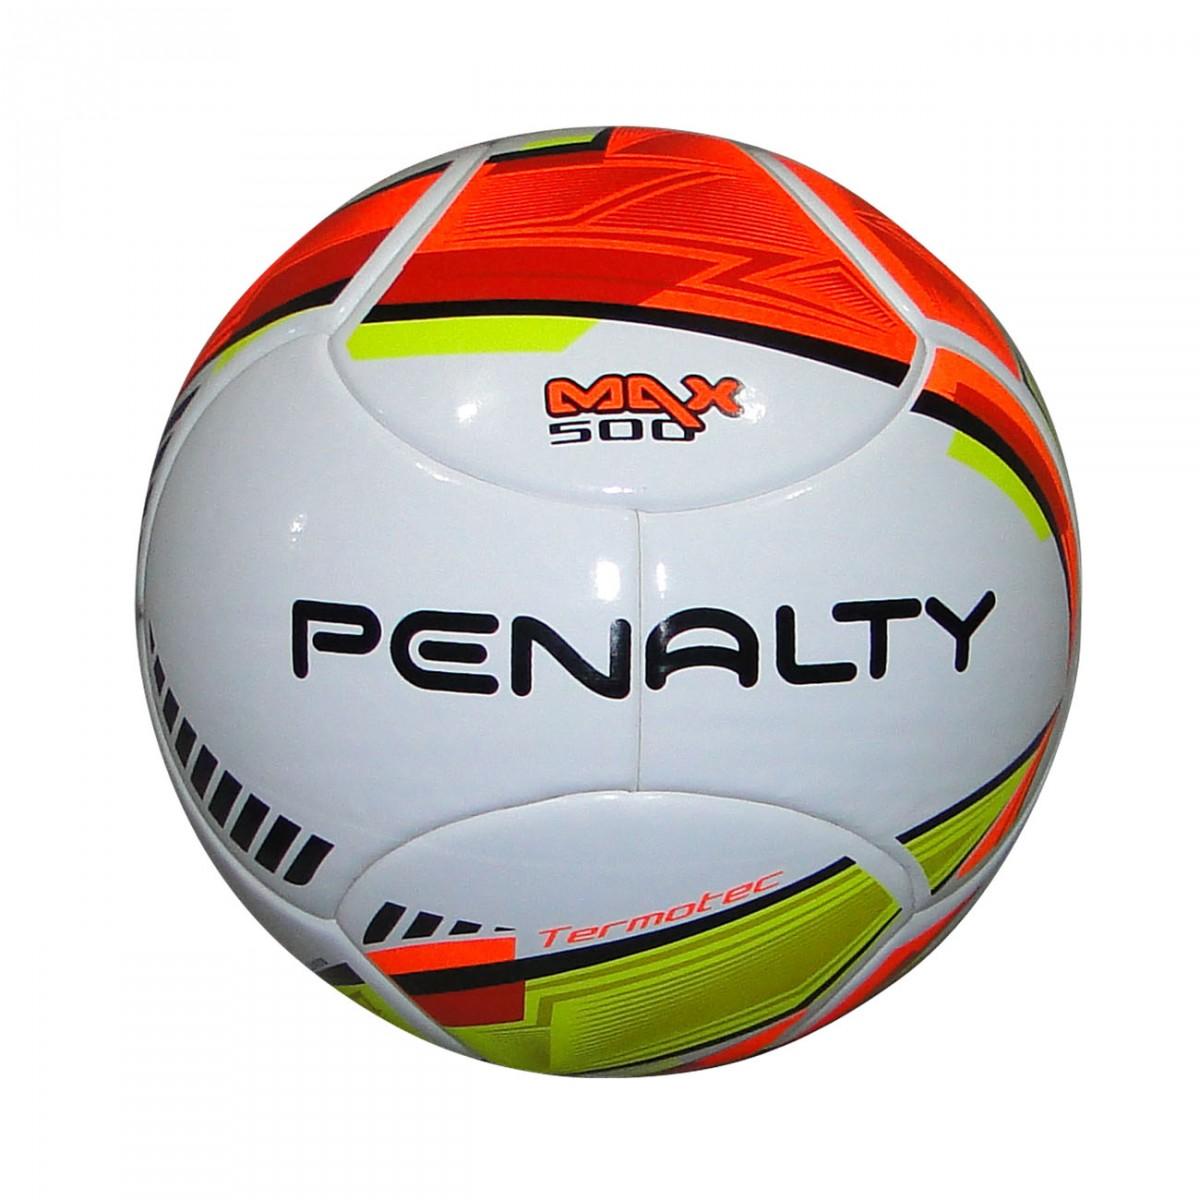 73ea6494fea26 Bola Penalty Max 500 Futsal 5412921830 - Branco Laranja Amarelo - Chuteira  Nike